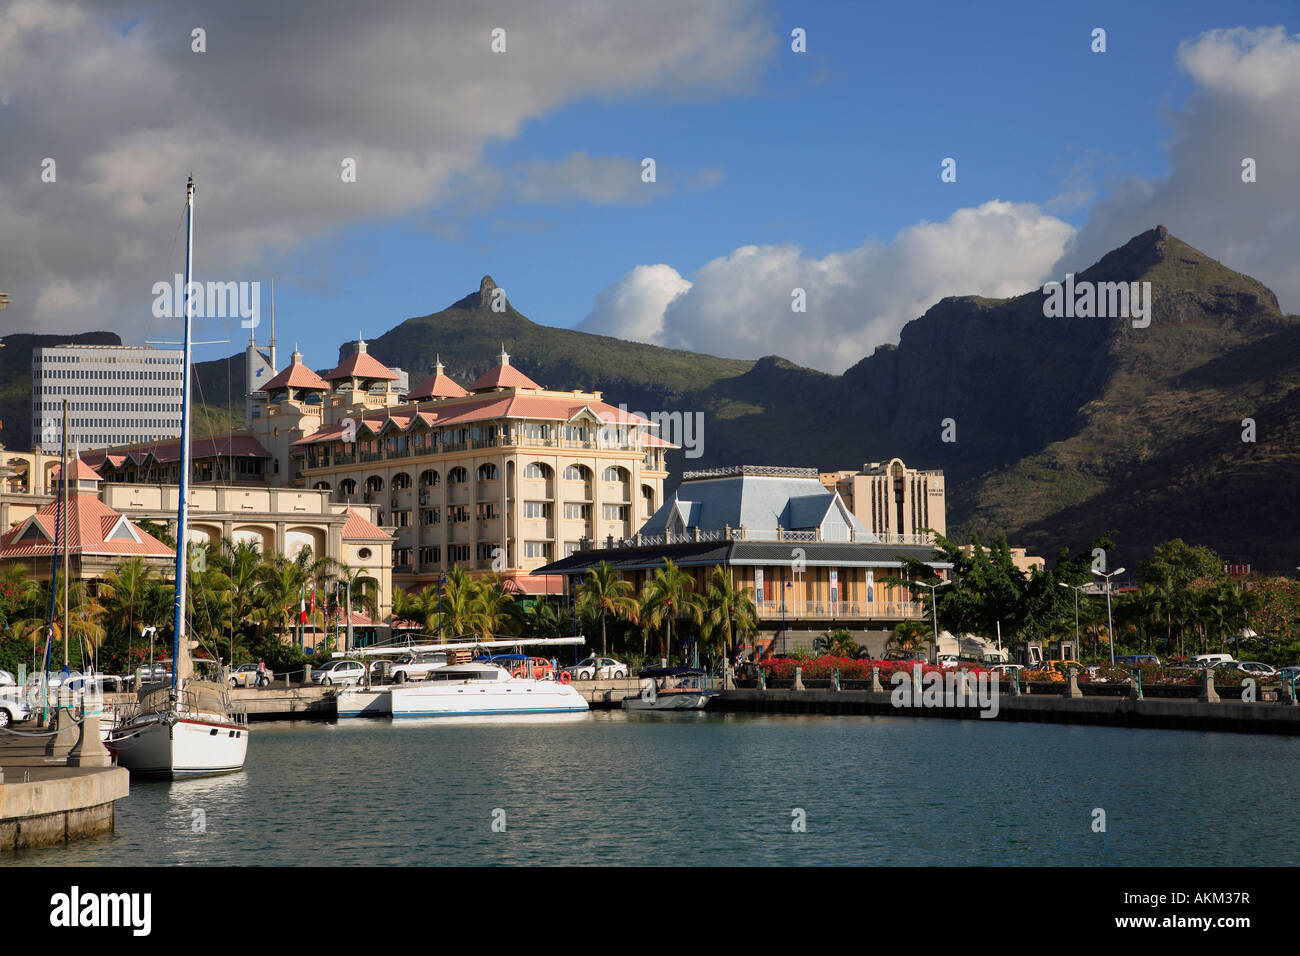 Mauritius port louis le caudan waterfront harbour stock photo royalty free image 15028810 alamy - Restaurants in port louis mauritius ...